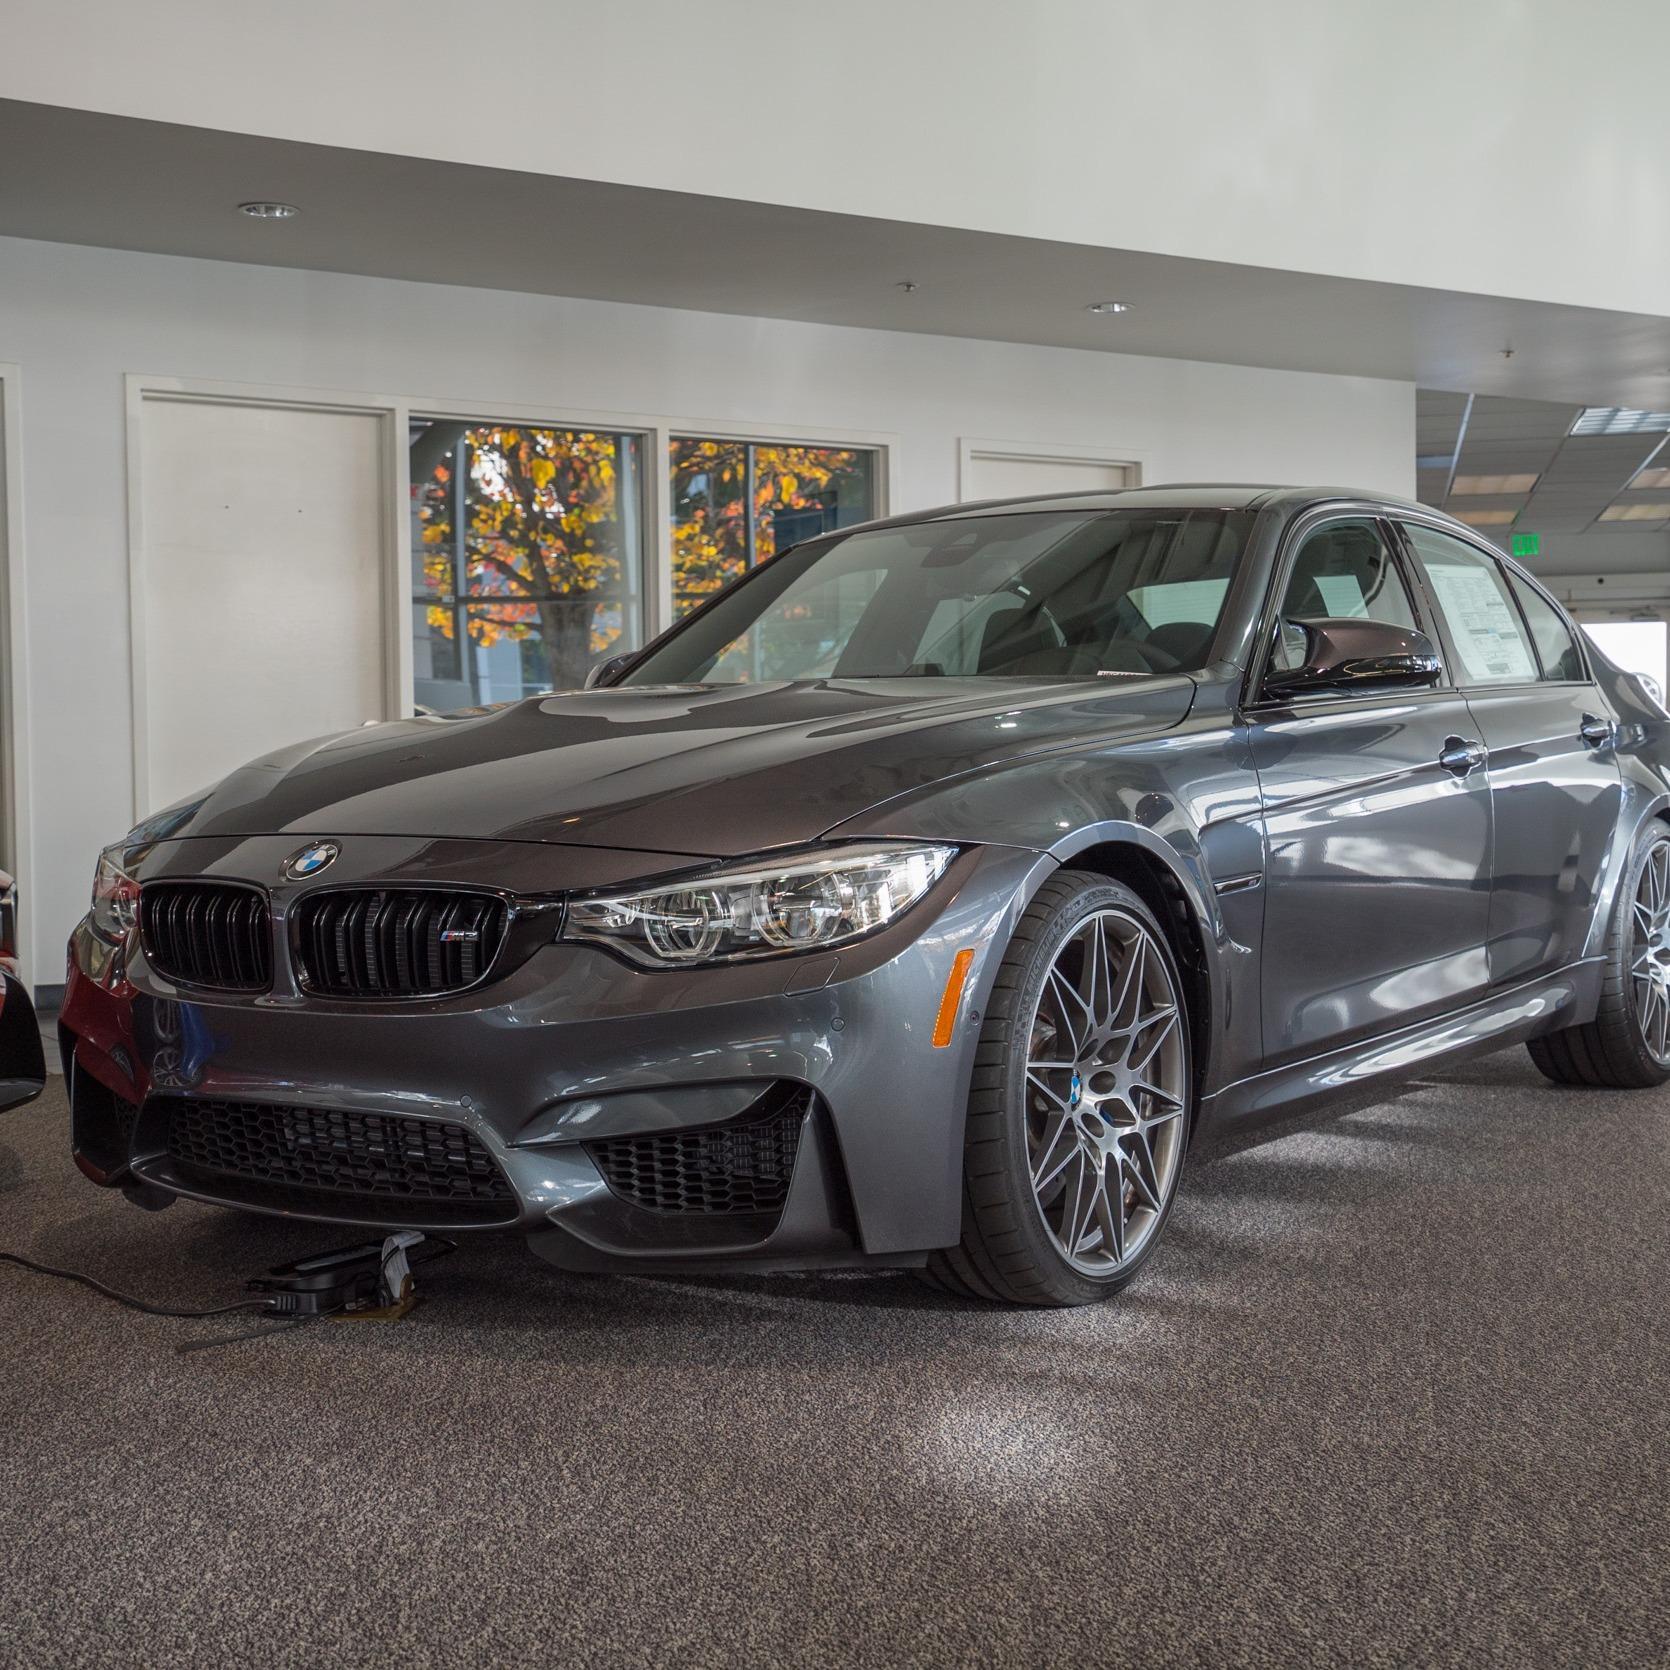 BMW of Mountain View